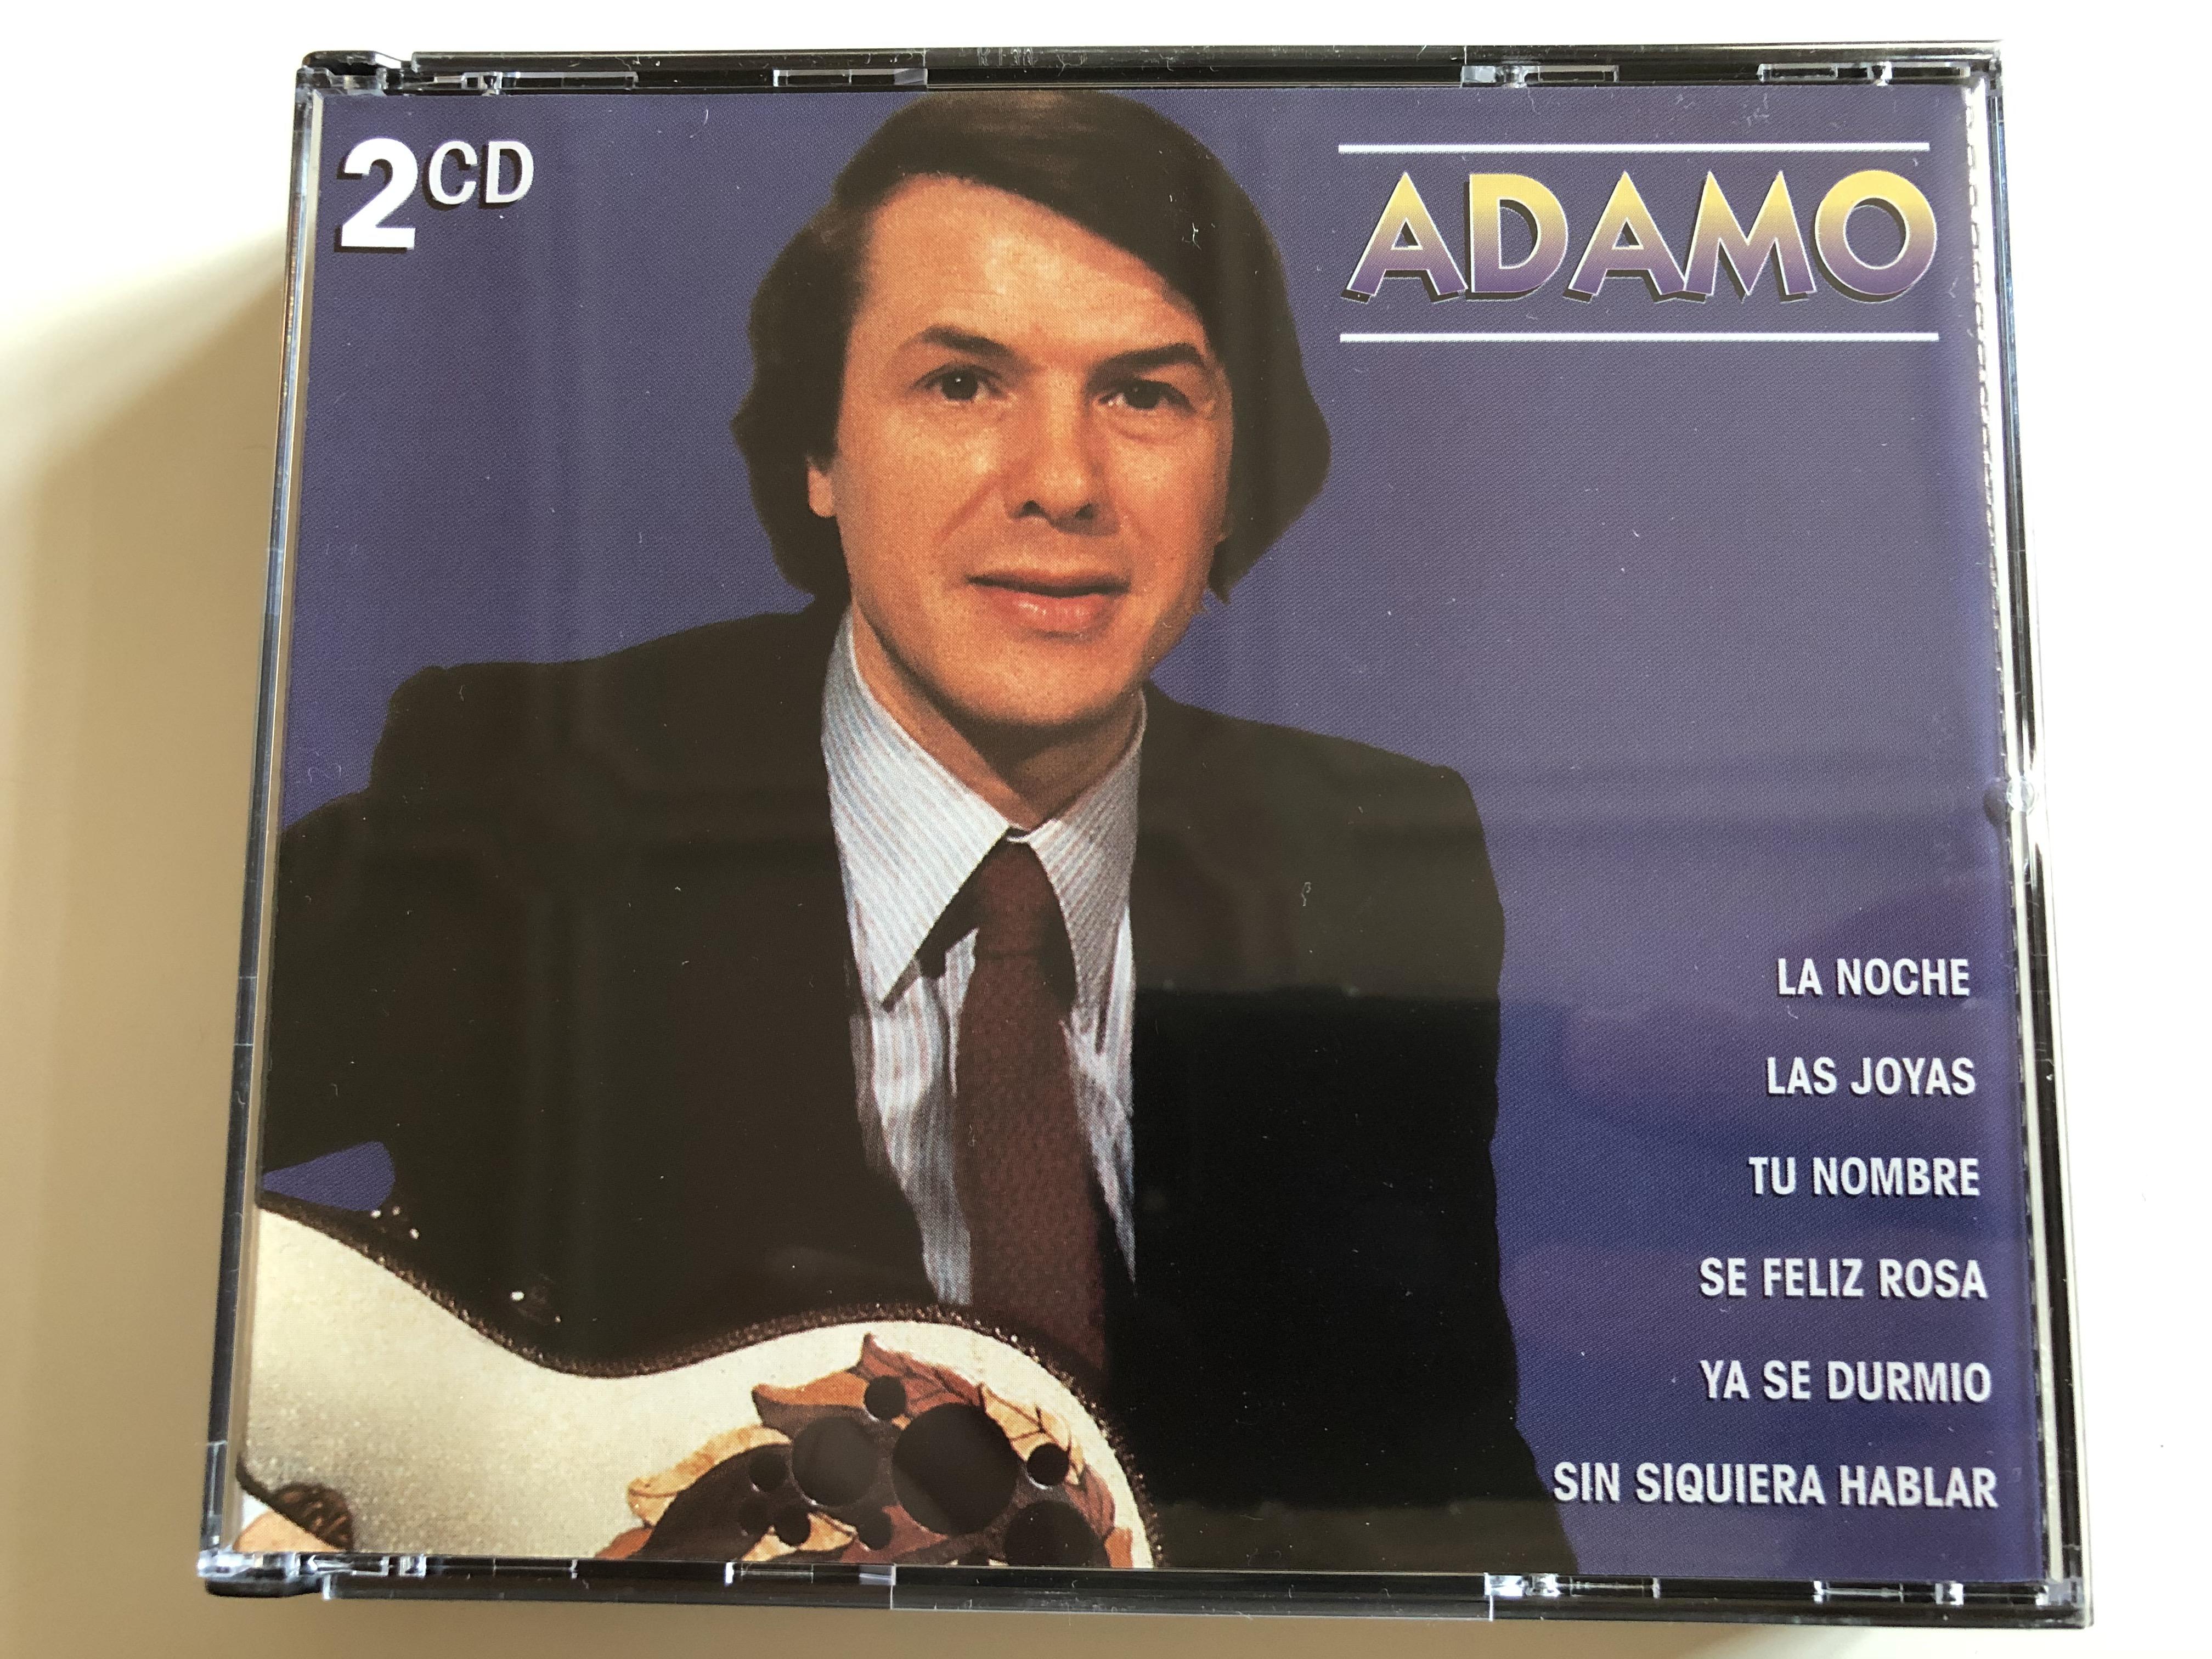 adamo-la-noche-las-joyas-tu-nombre-se-feliz-rosa-ya-se-durmio-sin-siquiera-hablar-biemstemra-2x-audio-cd-1997-kbox-269-1-.jpg